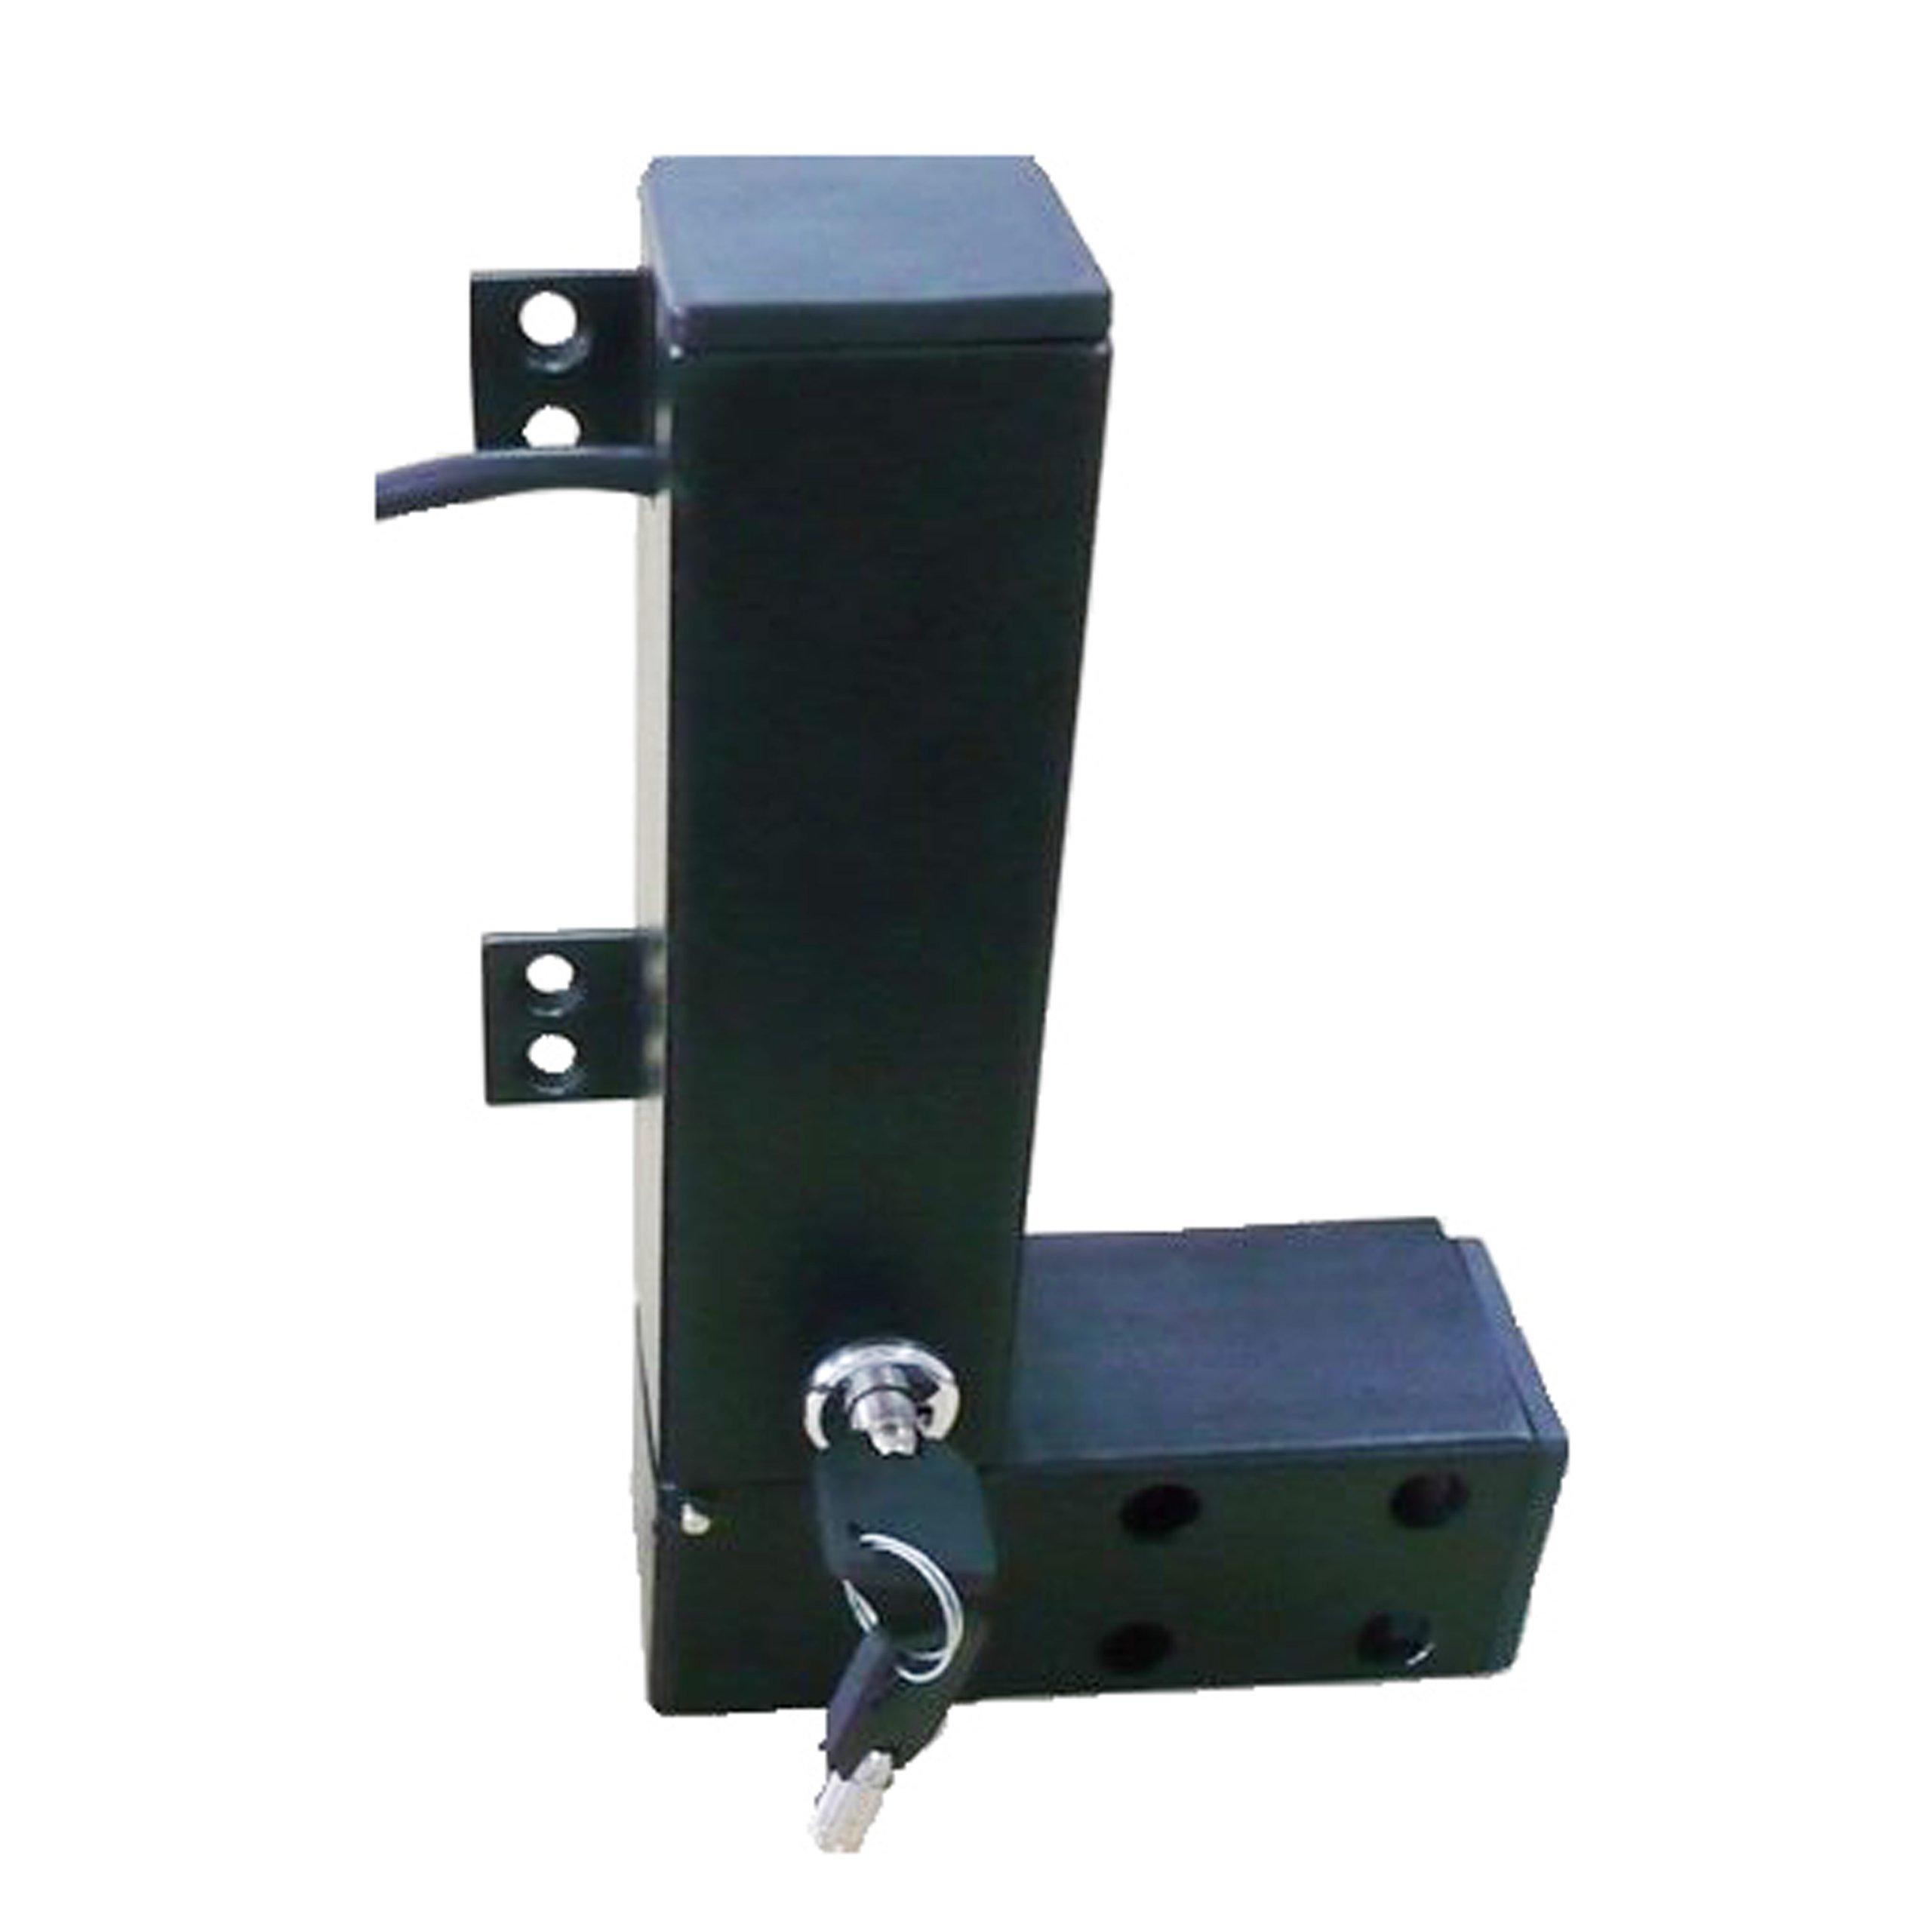 ALEKO LM148 Automatic Gate Lock For Sliding Gate Opener